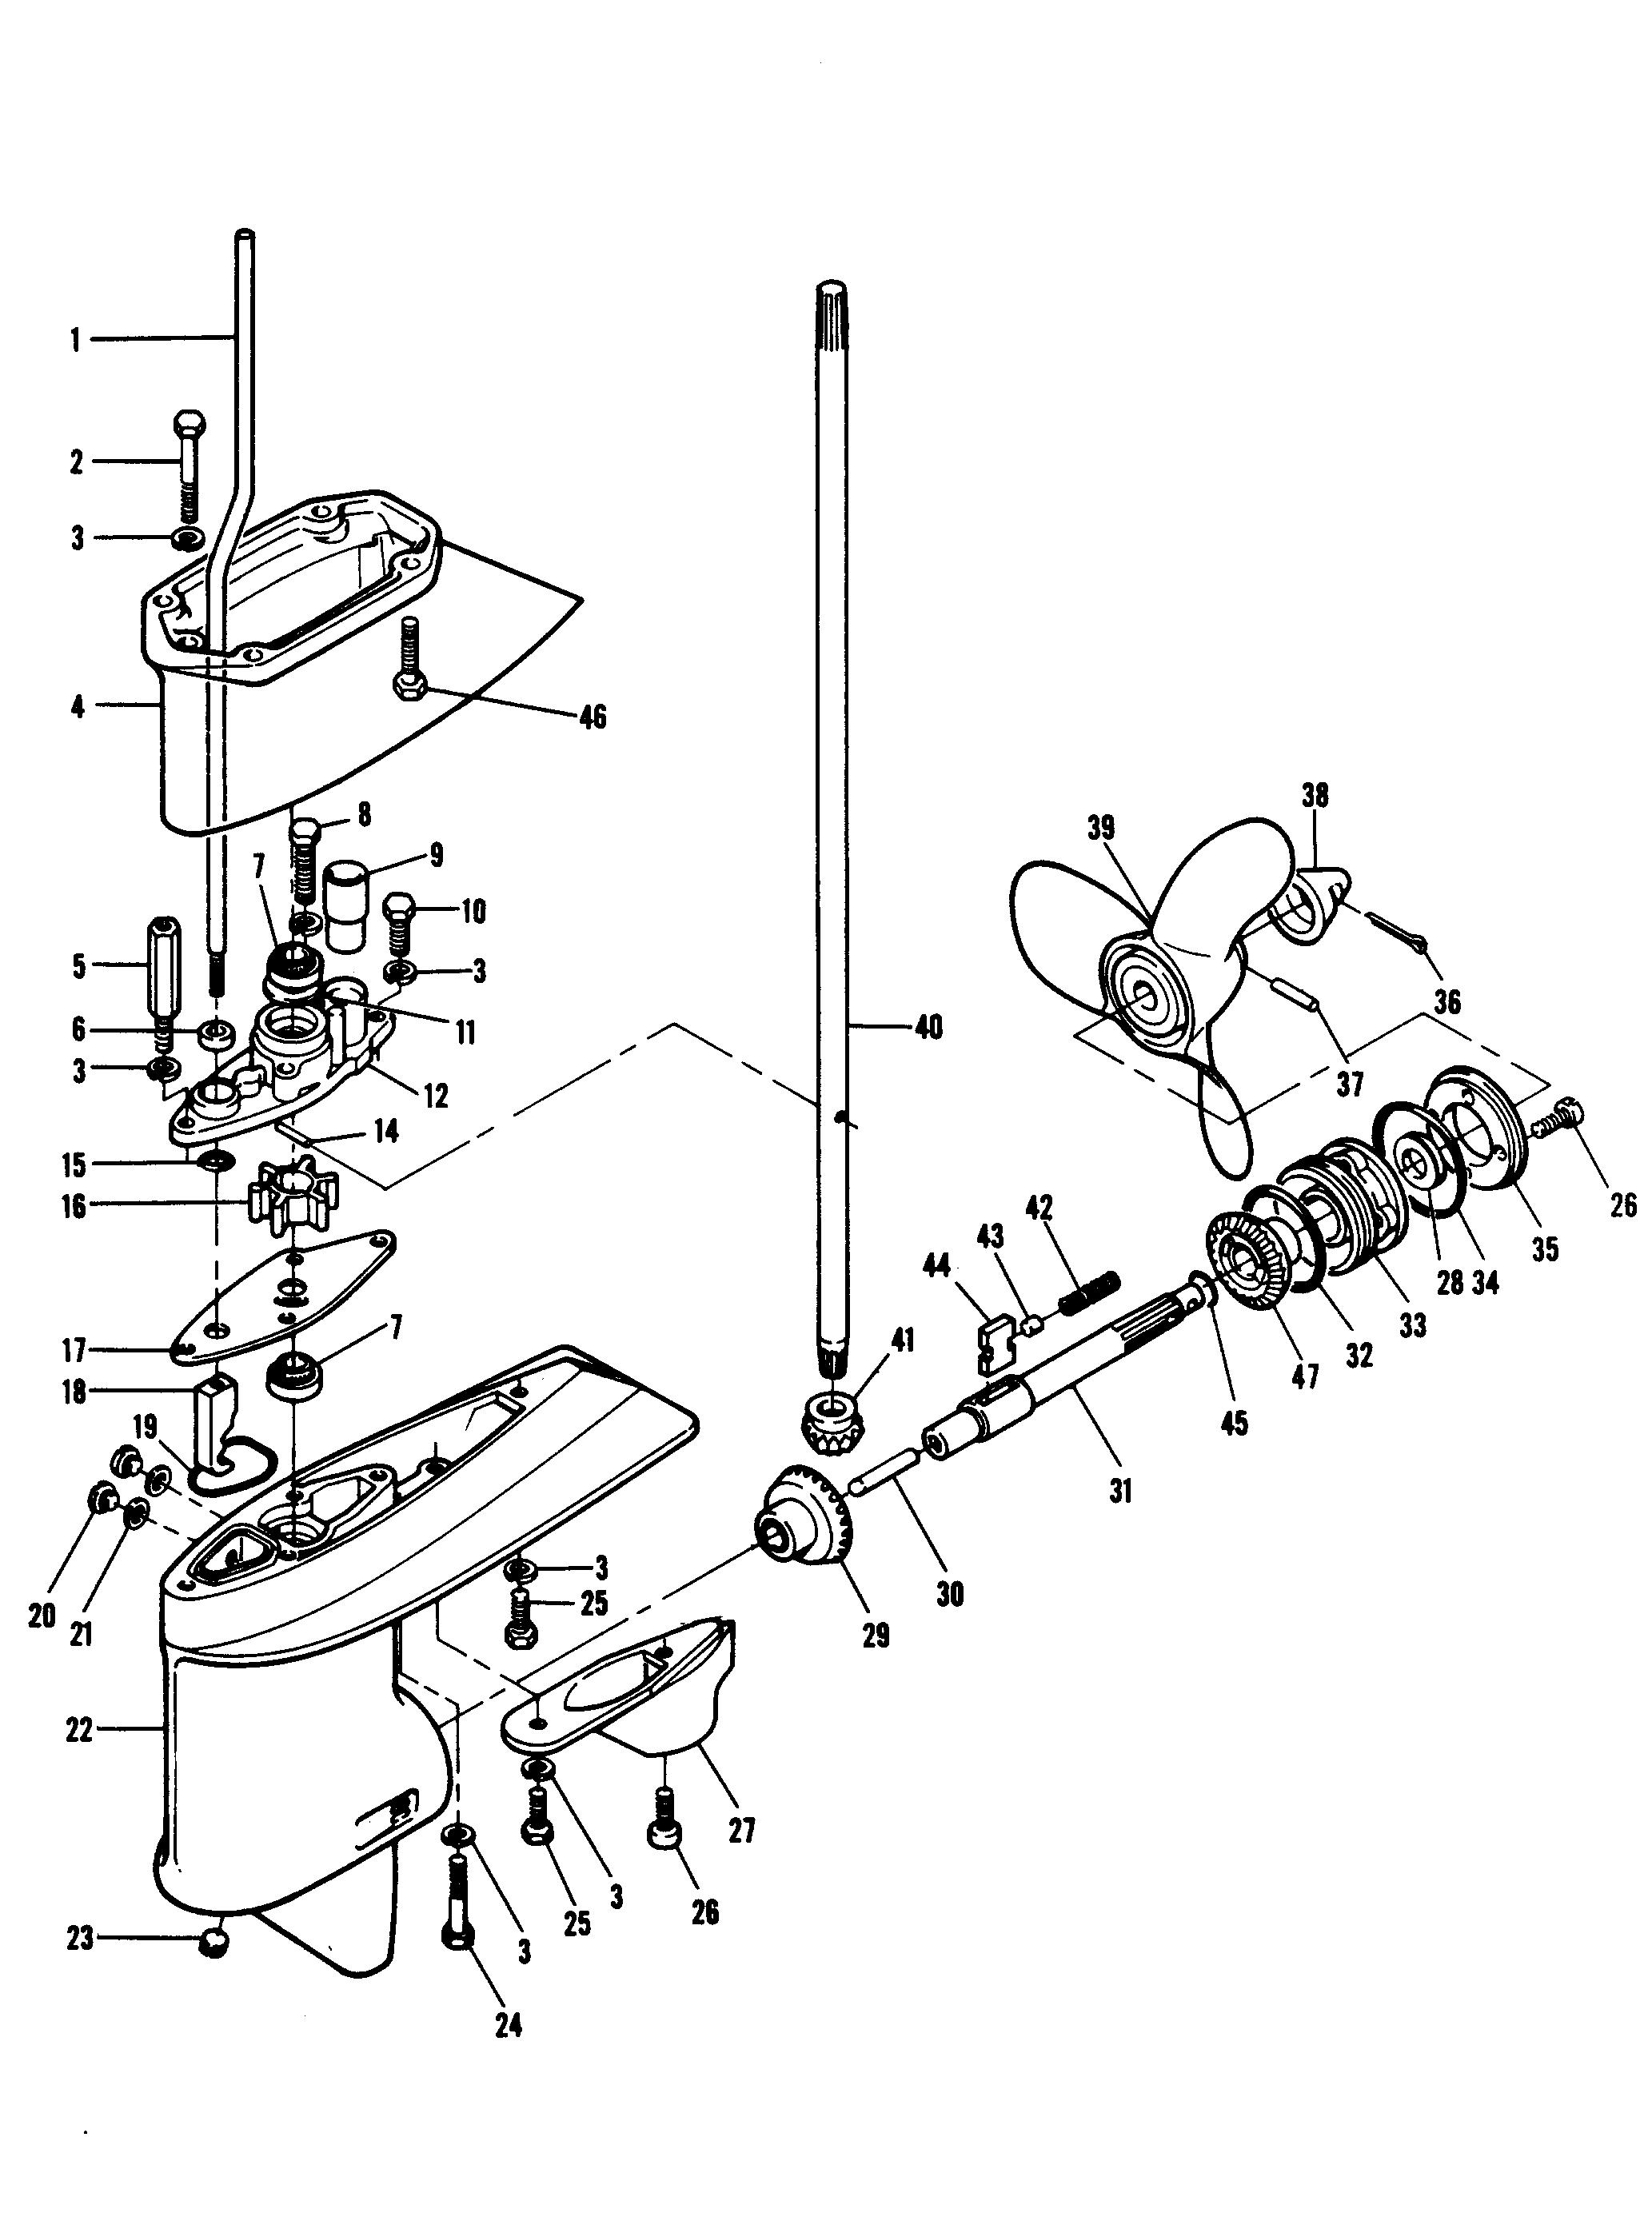 chrysler boat motor parts diagram - wiring diagrams calf-script-a -  calf-script-a.mumblestudio.it  mumblestudio.it